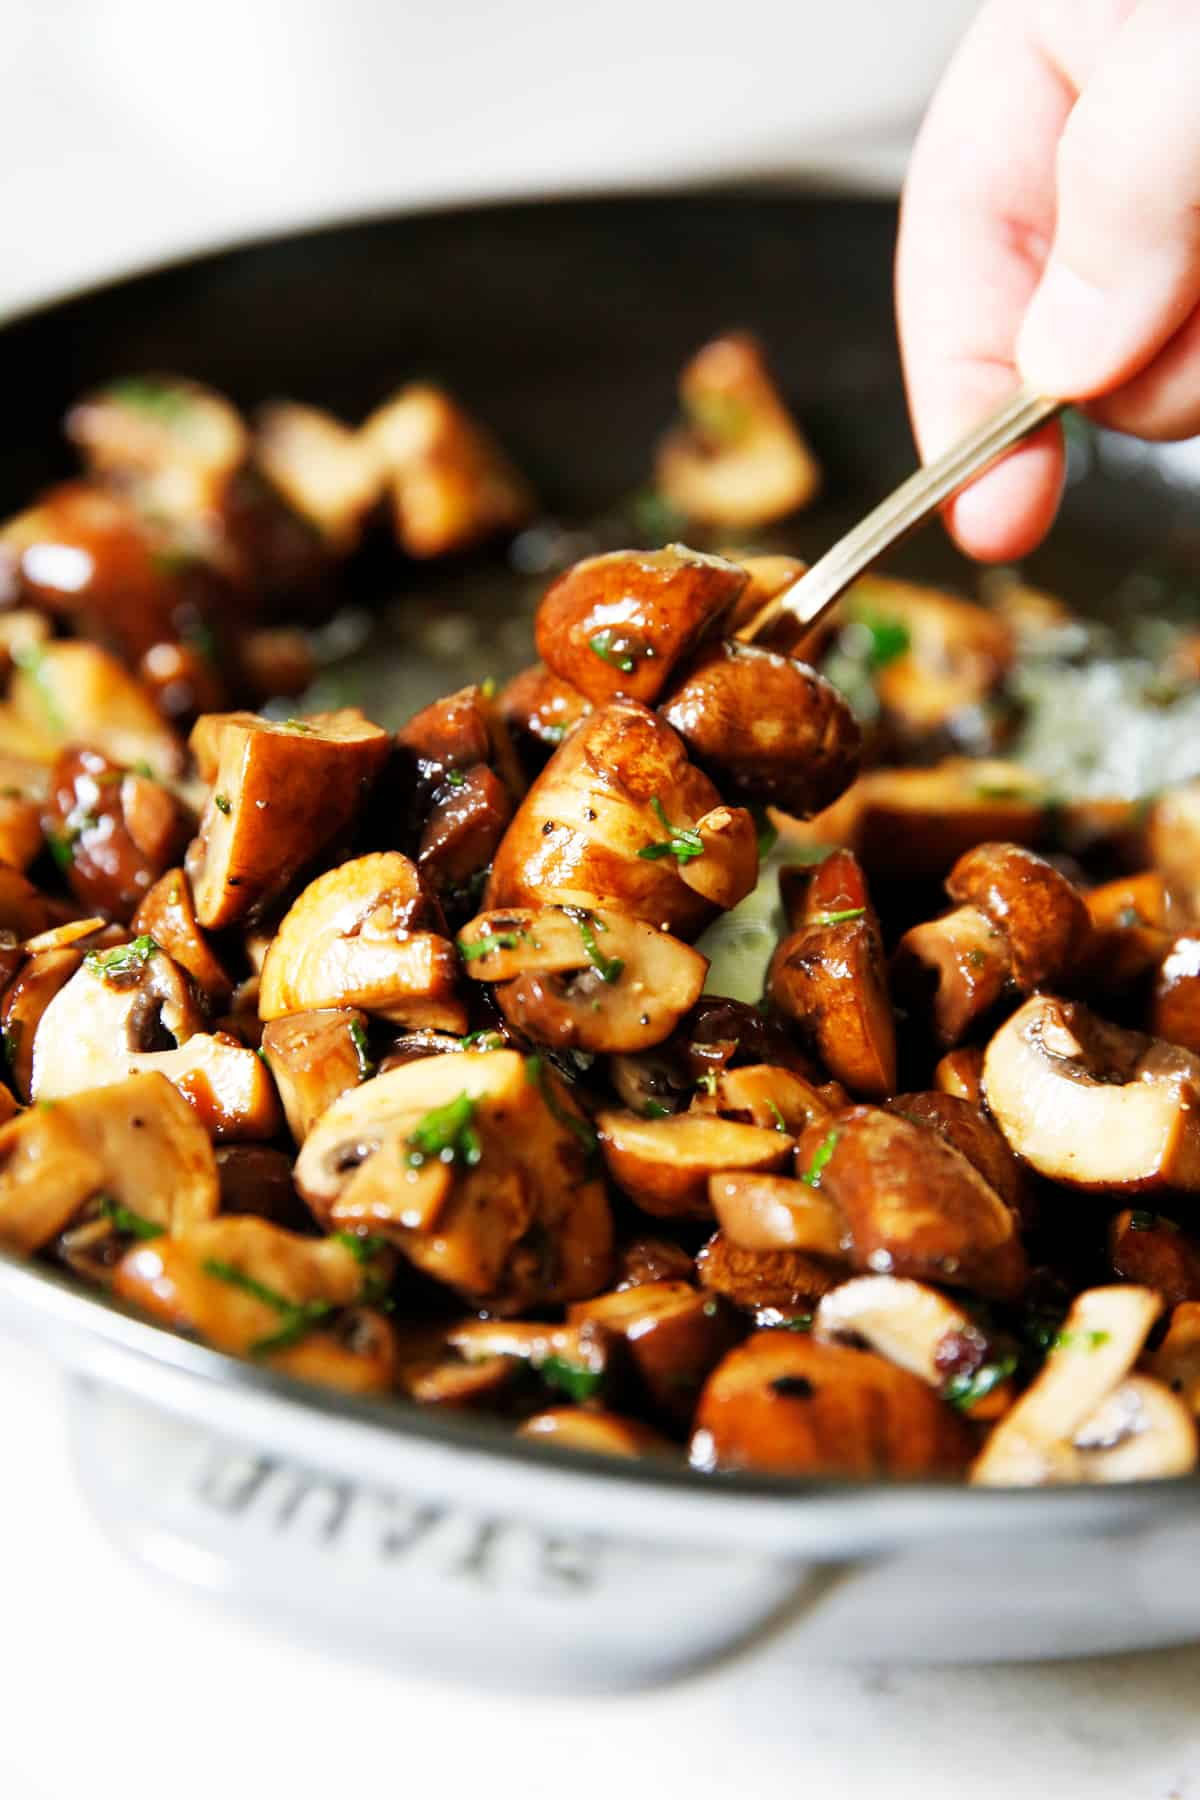 The Ultimate Garlicky Mushroom Side Dish